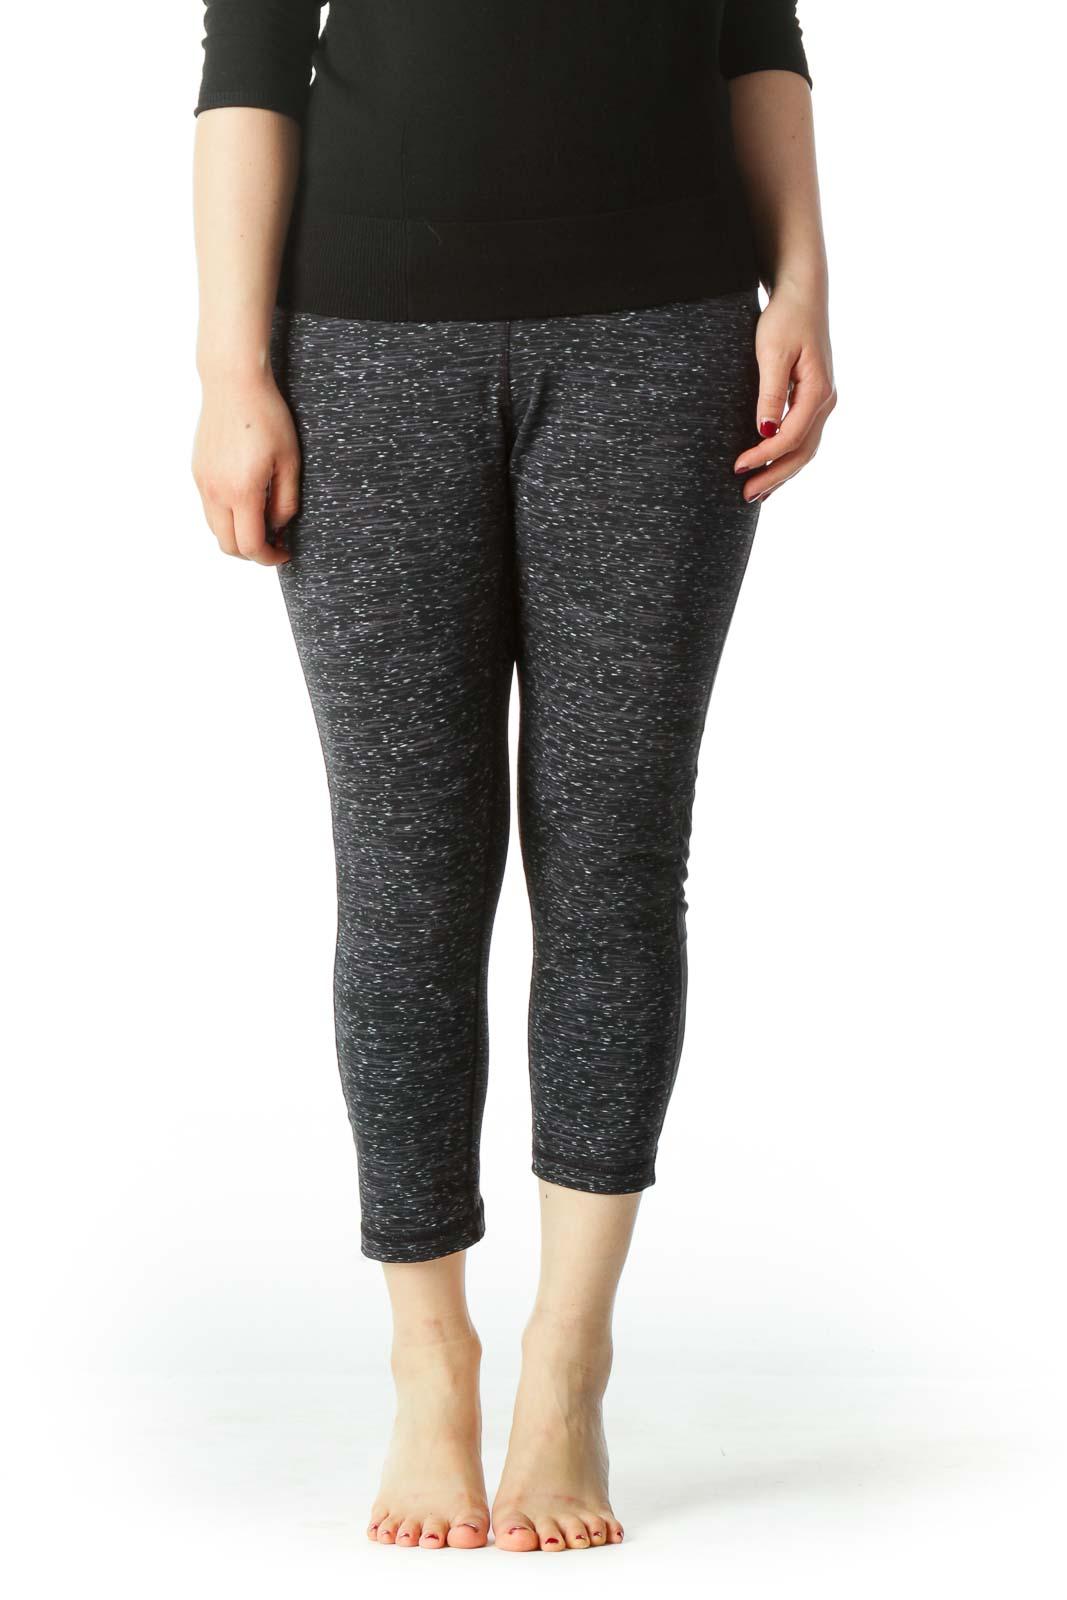 Black and Gray Stretch Capri Yoga Pants  Front